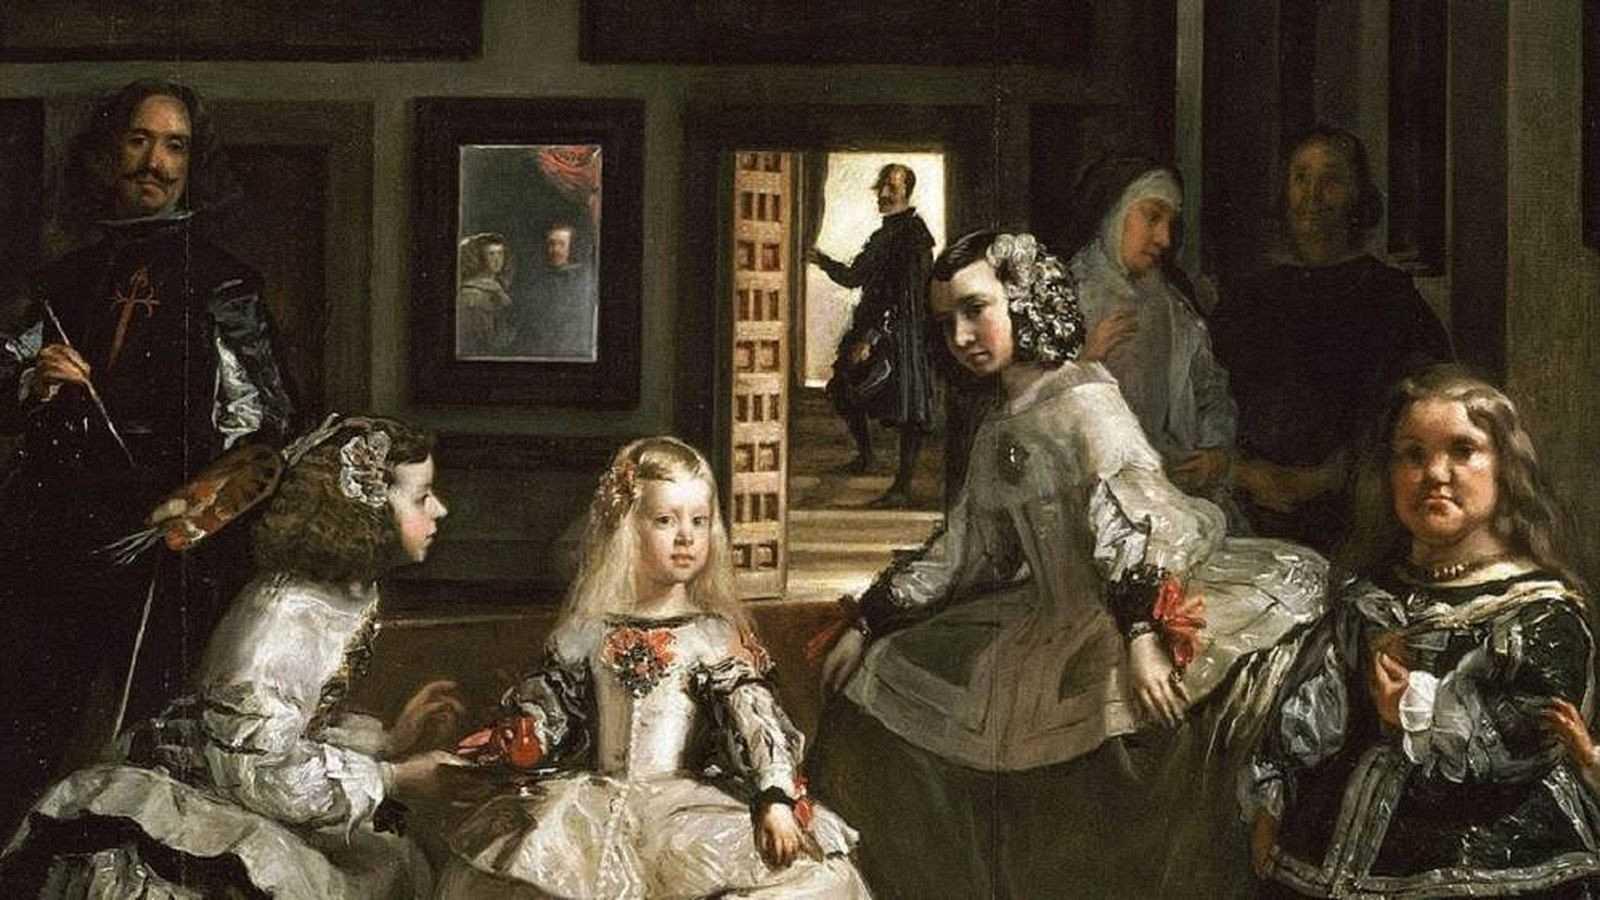 Música antigua - Velázquez - 12/01/21 - escuchar ahora